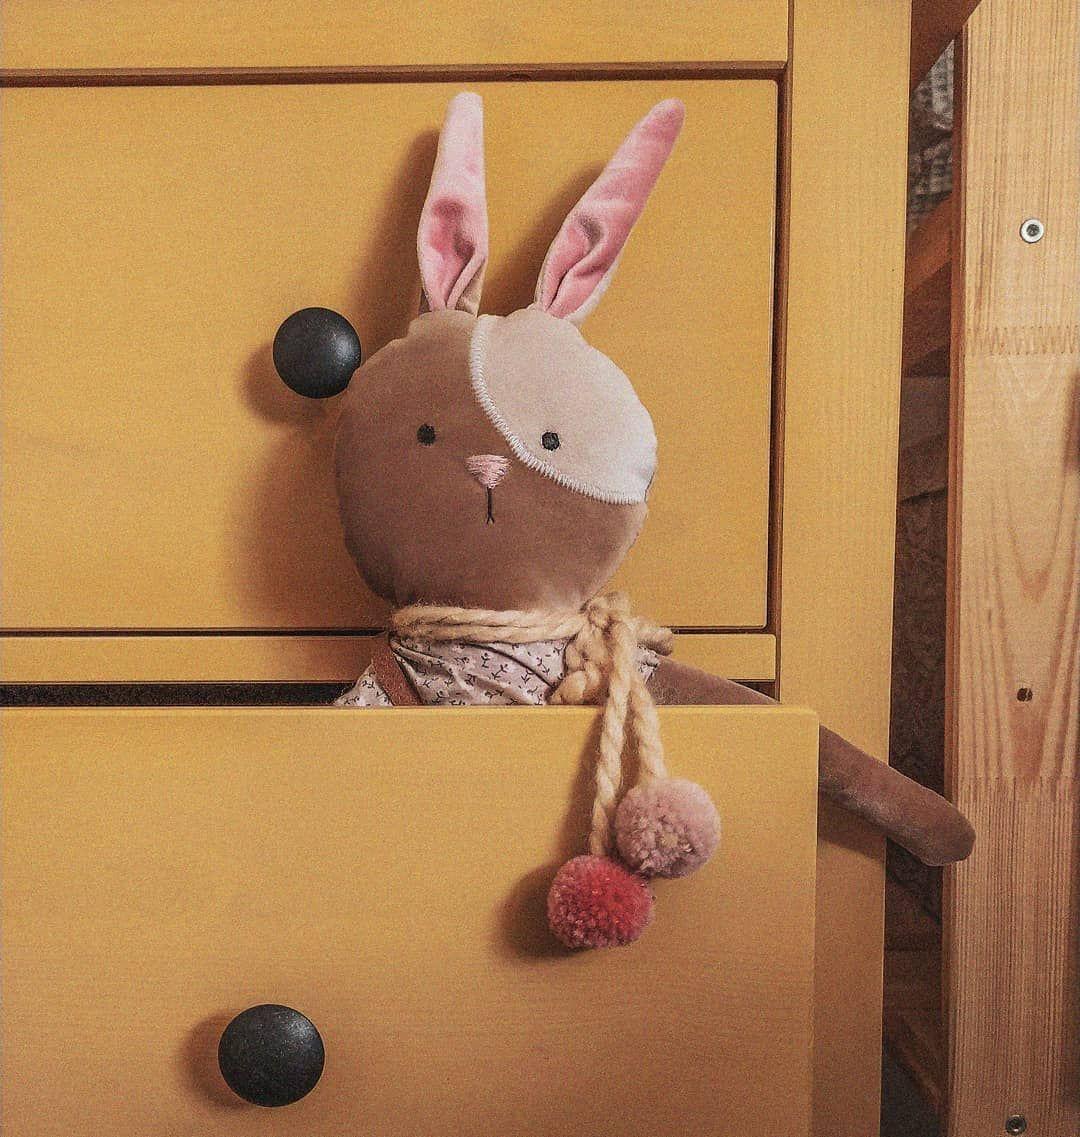 Hello everybunny ☺🐰 _________________________ #bunny #dollbunny #bunnydoll #handmadedoll #handcrafted #handmade #etsydoll #etsy #etsyseller #crafts #sewing #sewingdolls #doll #plush #plushie #plushiesofinstagram #softdoll